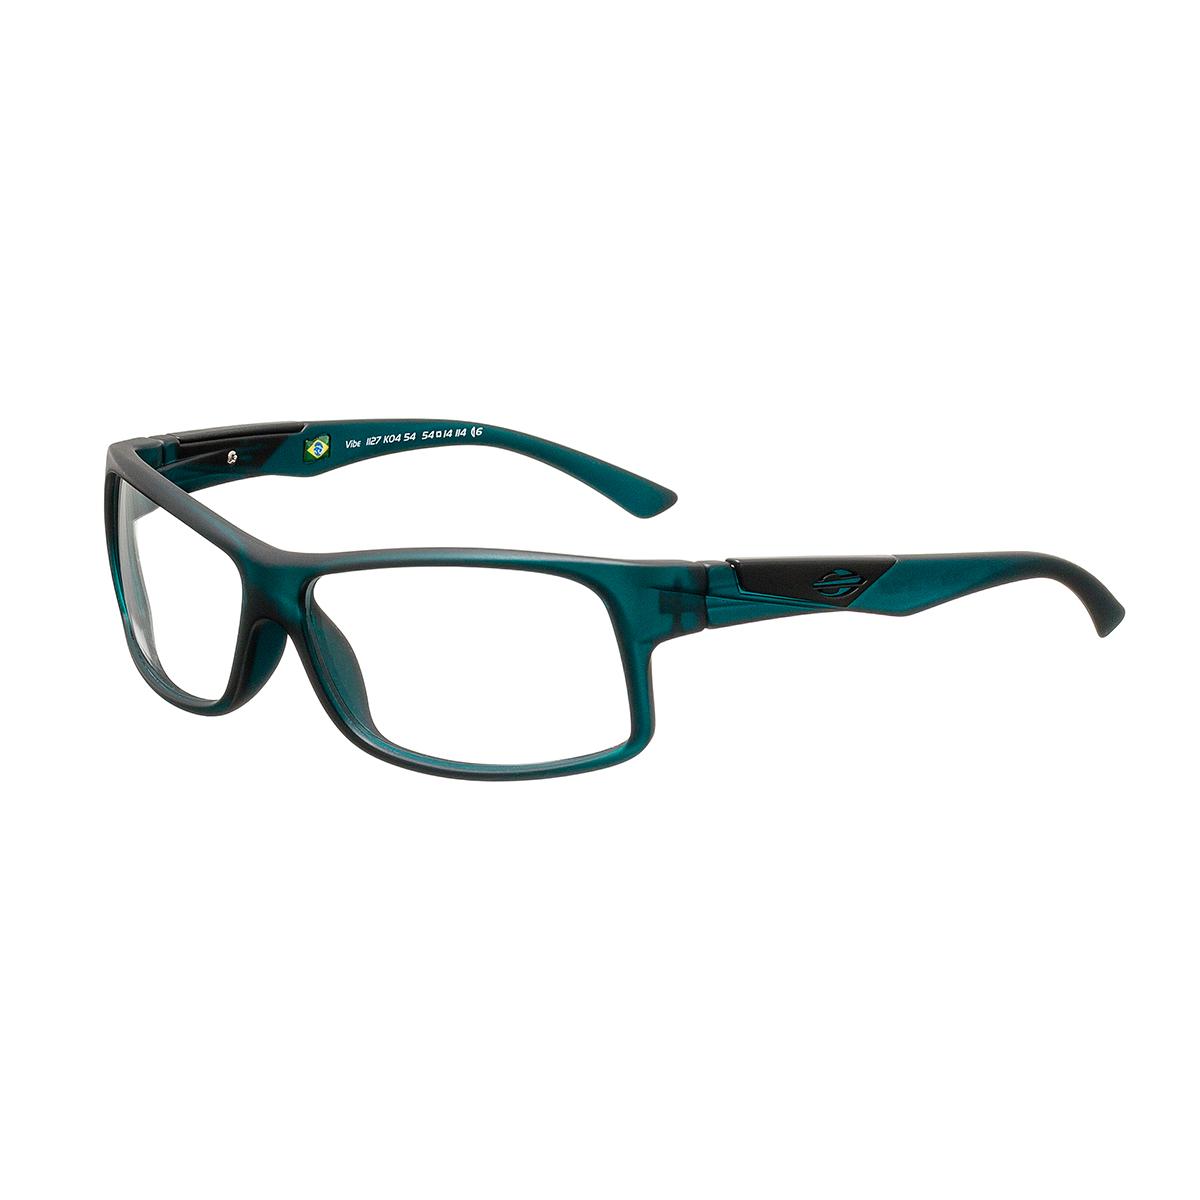 ca7901a7b5501 Óculos de Grau Masculino Mormaii Vibe 1127 K04 Tam.54MormaiiMormaii ...